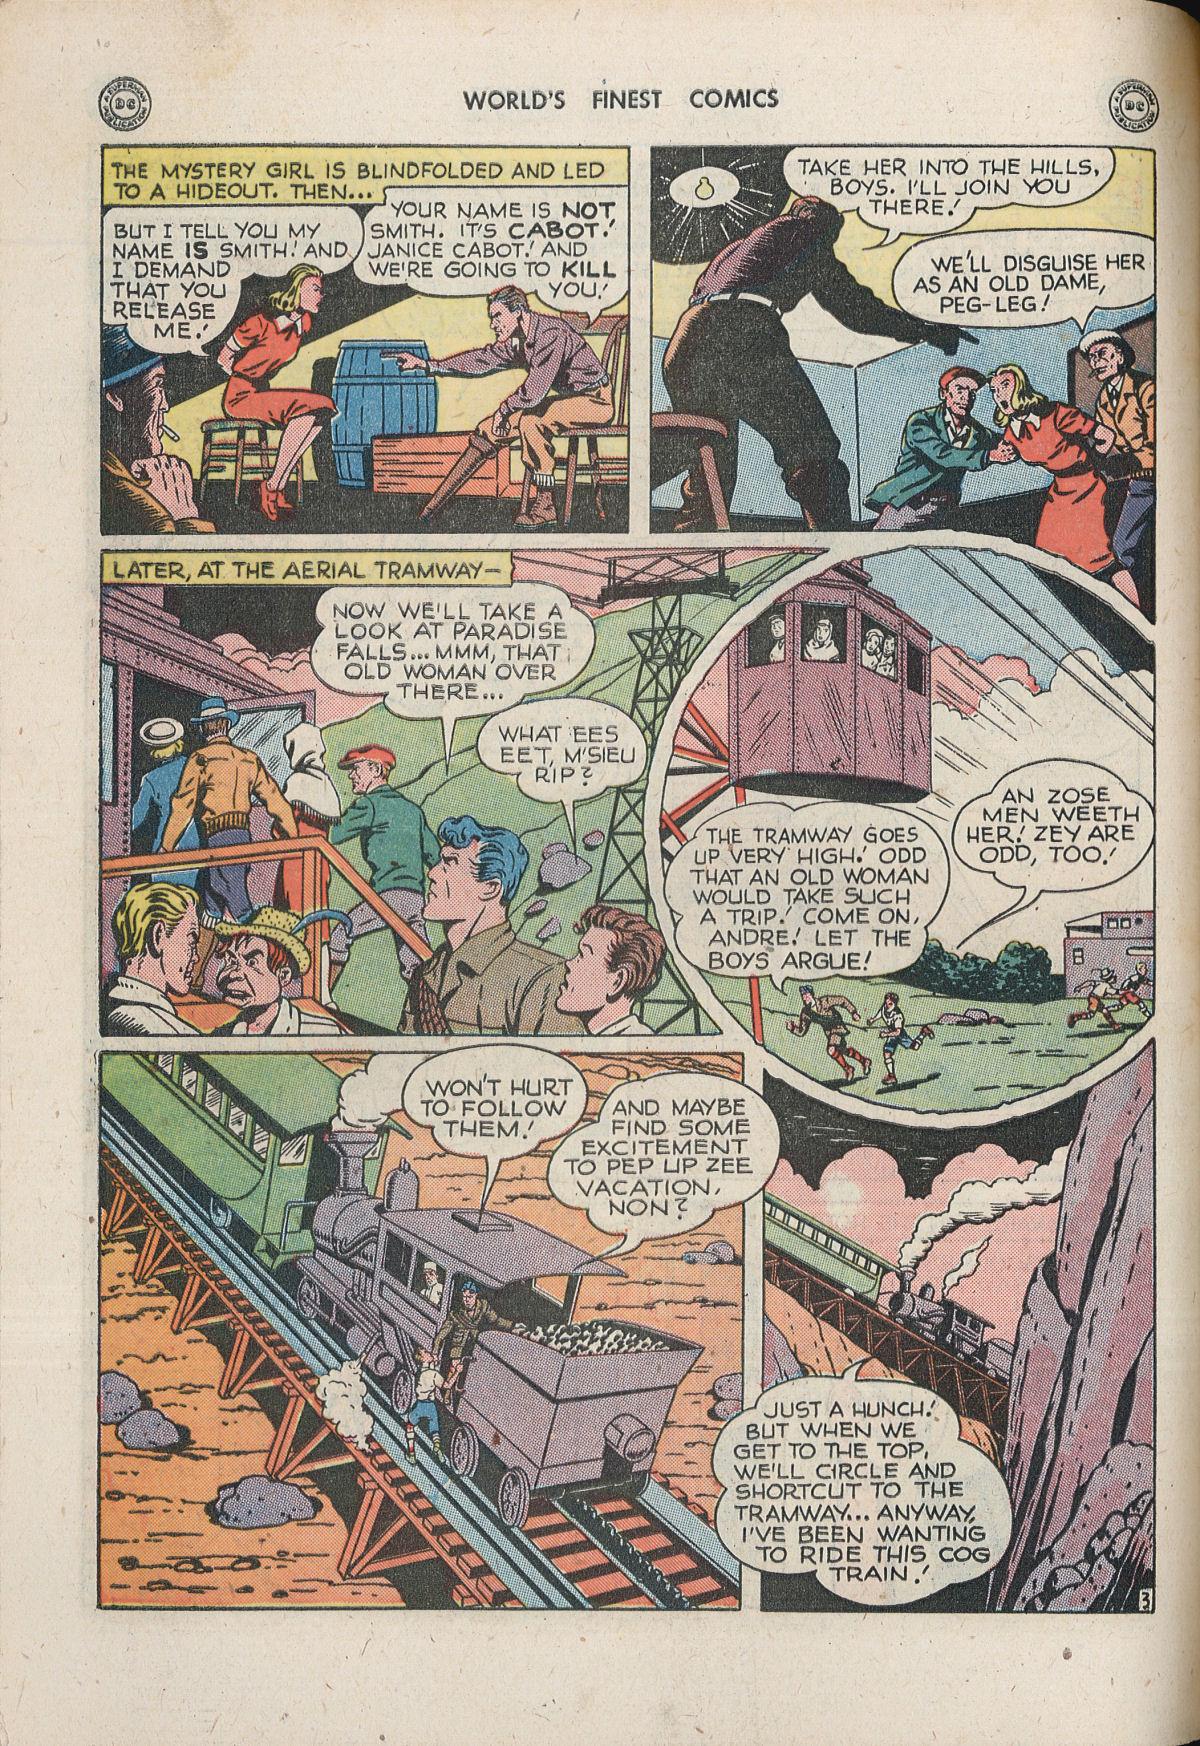 Read online World's Finest Comics comic -  Issue #33 - 50